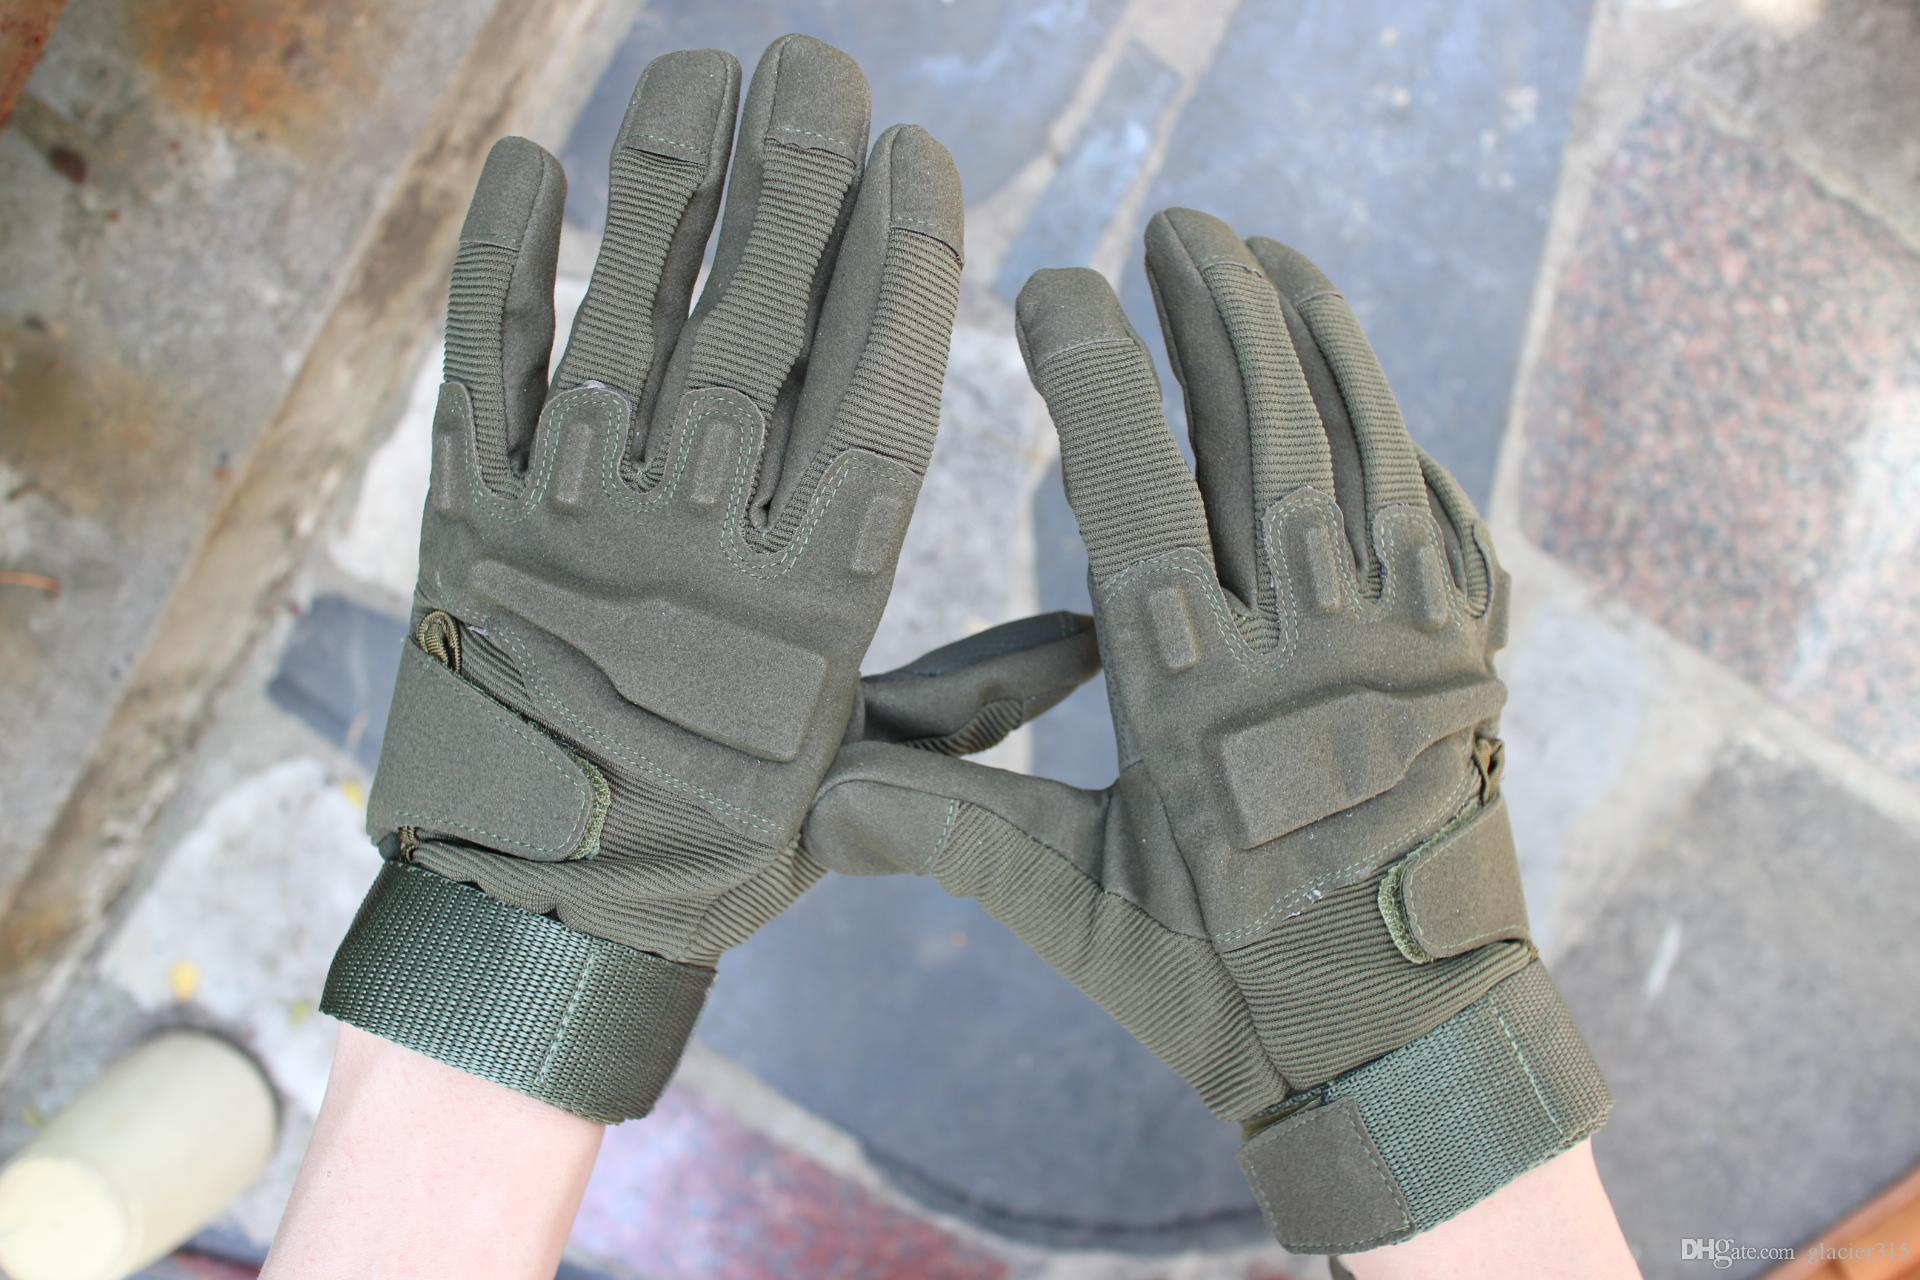 Envío gratis 1 par Nueva venta Full finger Tactical Weather Shooting Militar Ciclismo caza Camping Deporte Juego exterior Guantes